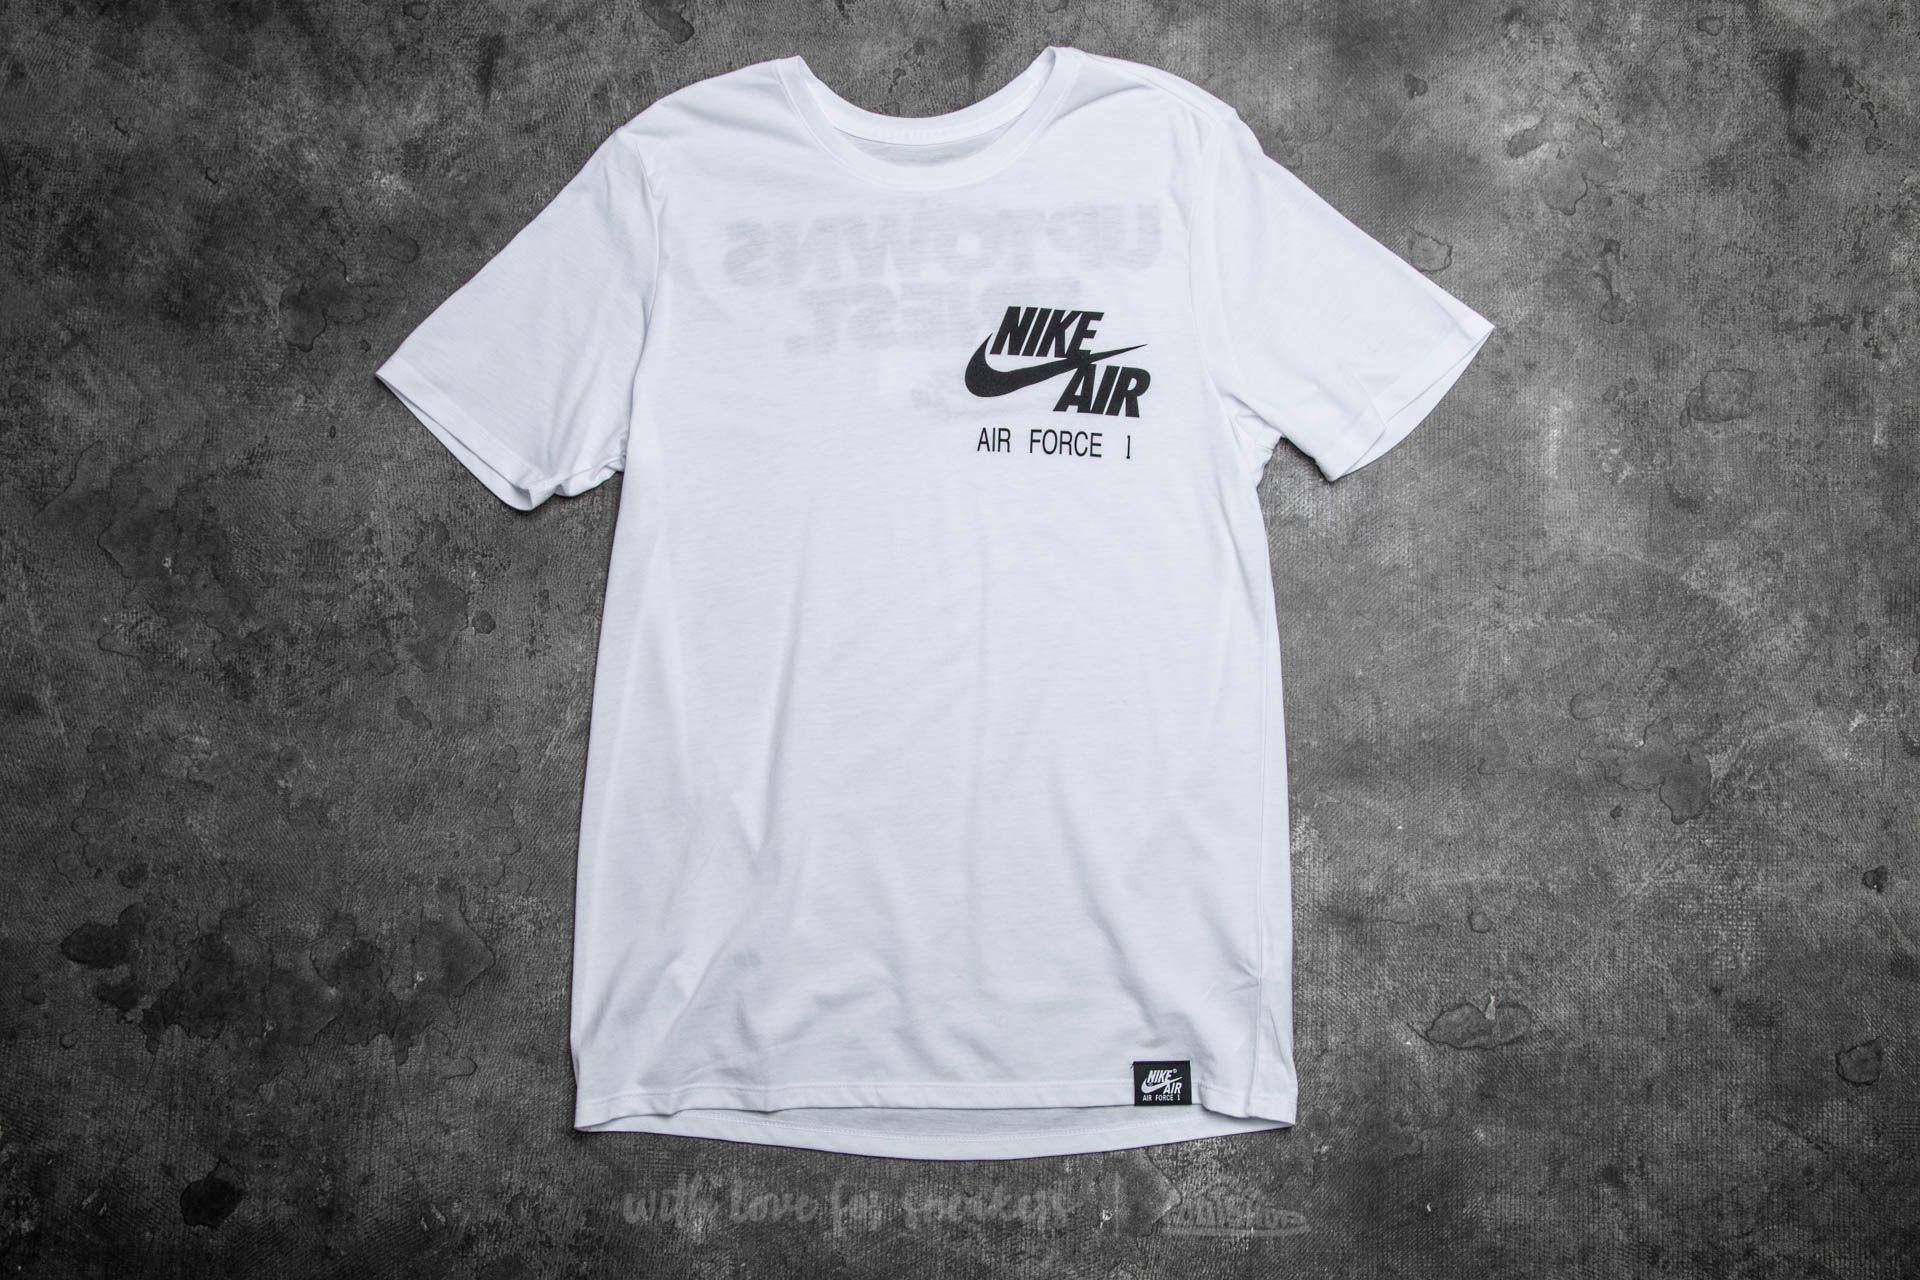 94f5b3b7 Nike Sportswear Air Force 1 Uptown's Finest Tee White/ Black ...